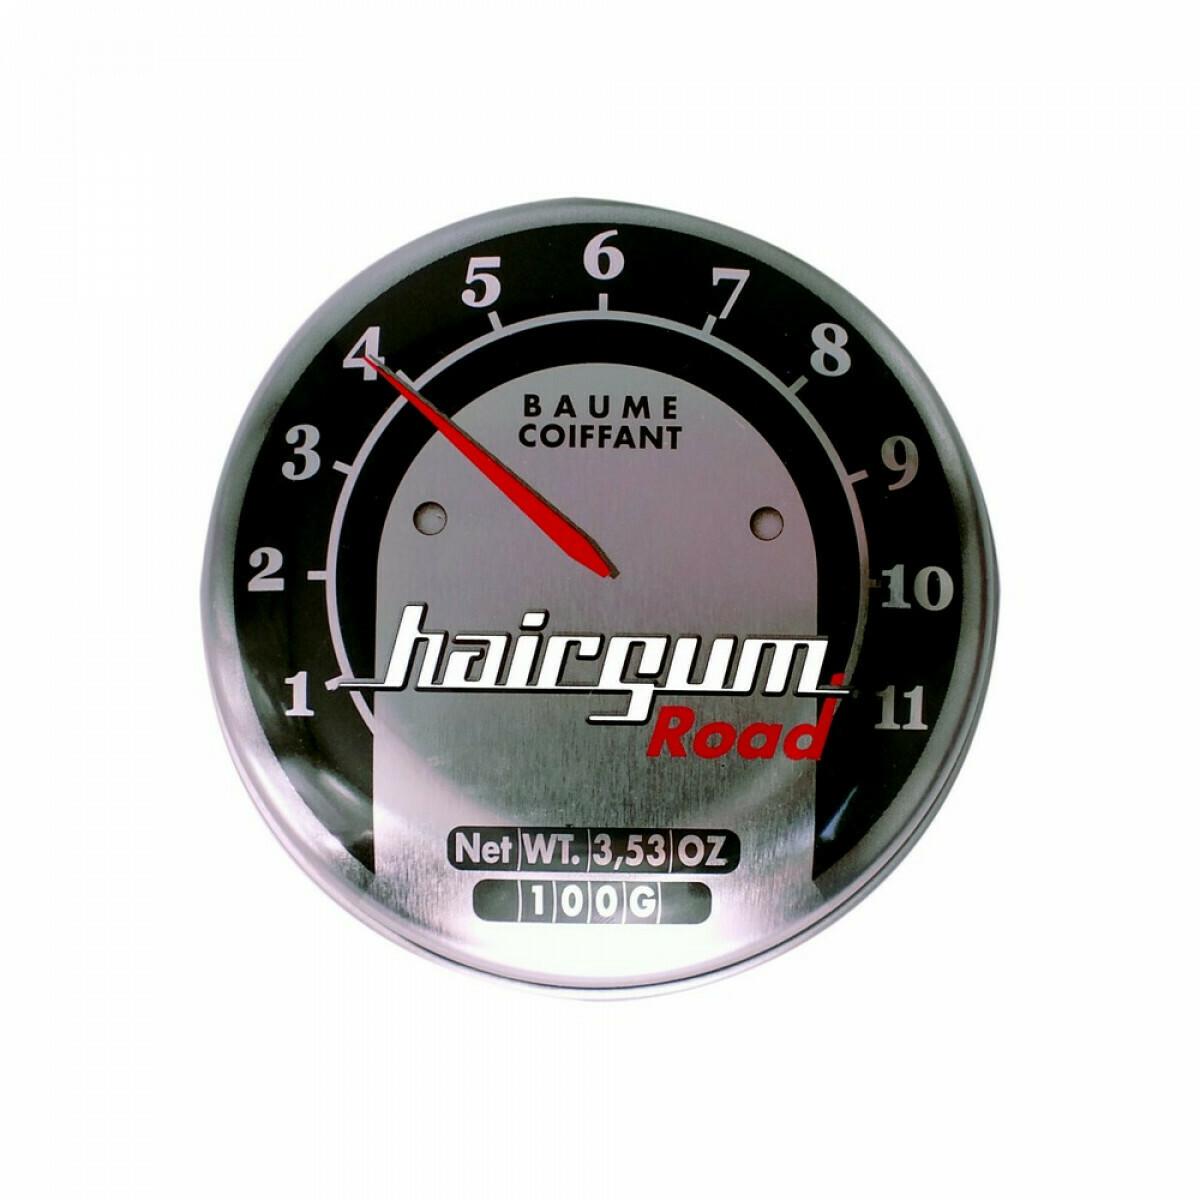 Baume coiffant Road - 100ml - Fixant Hairgum